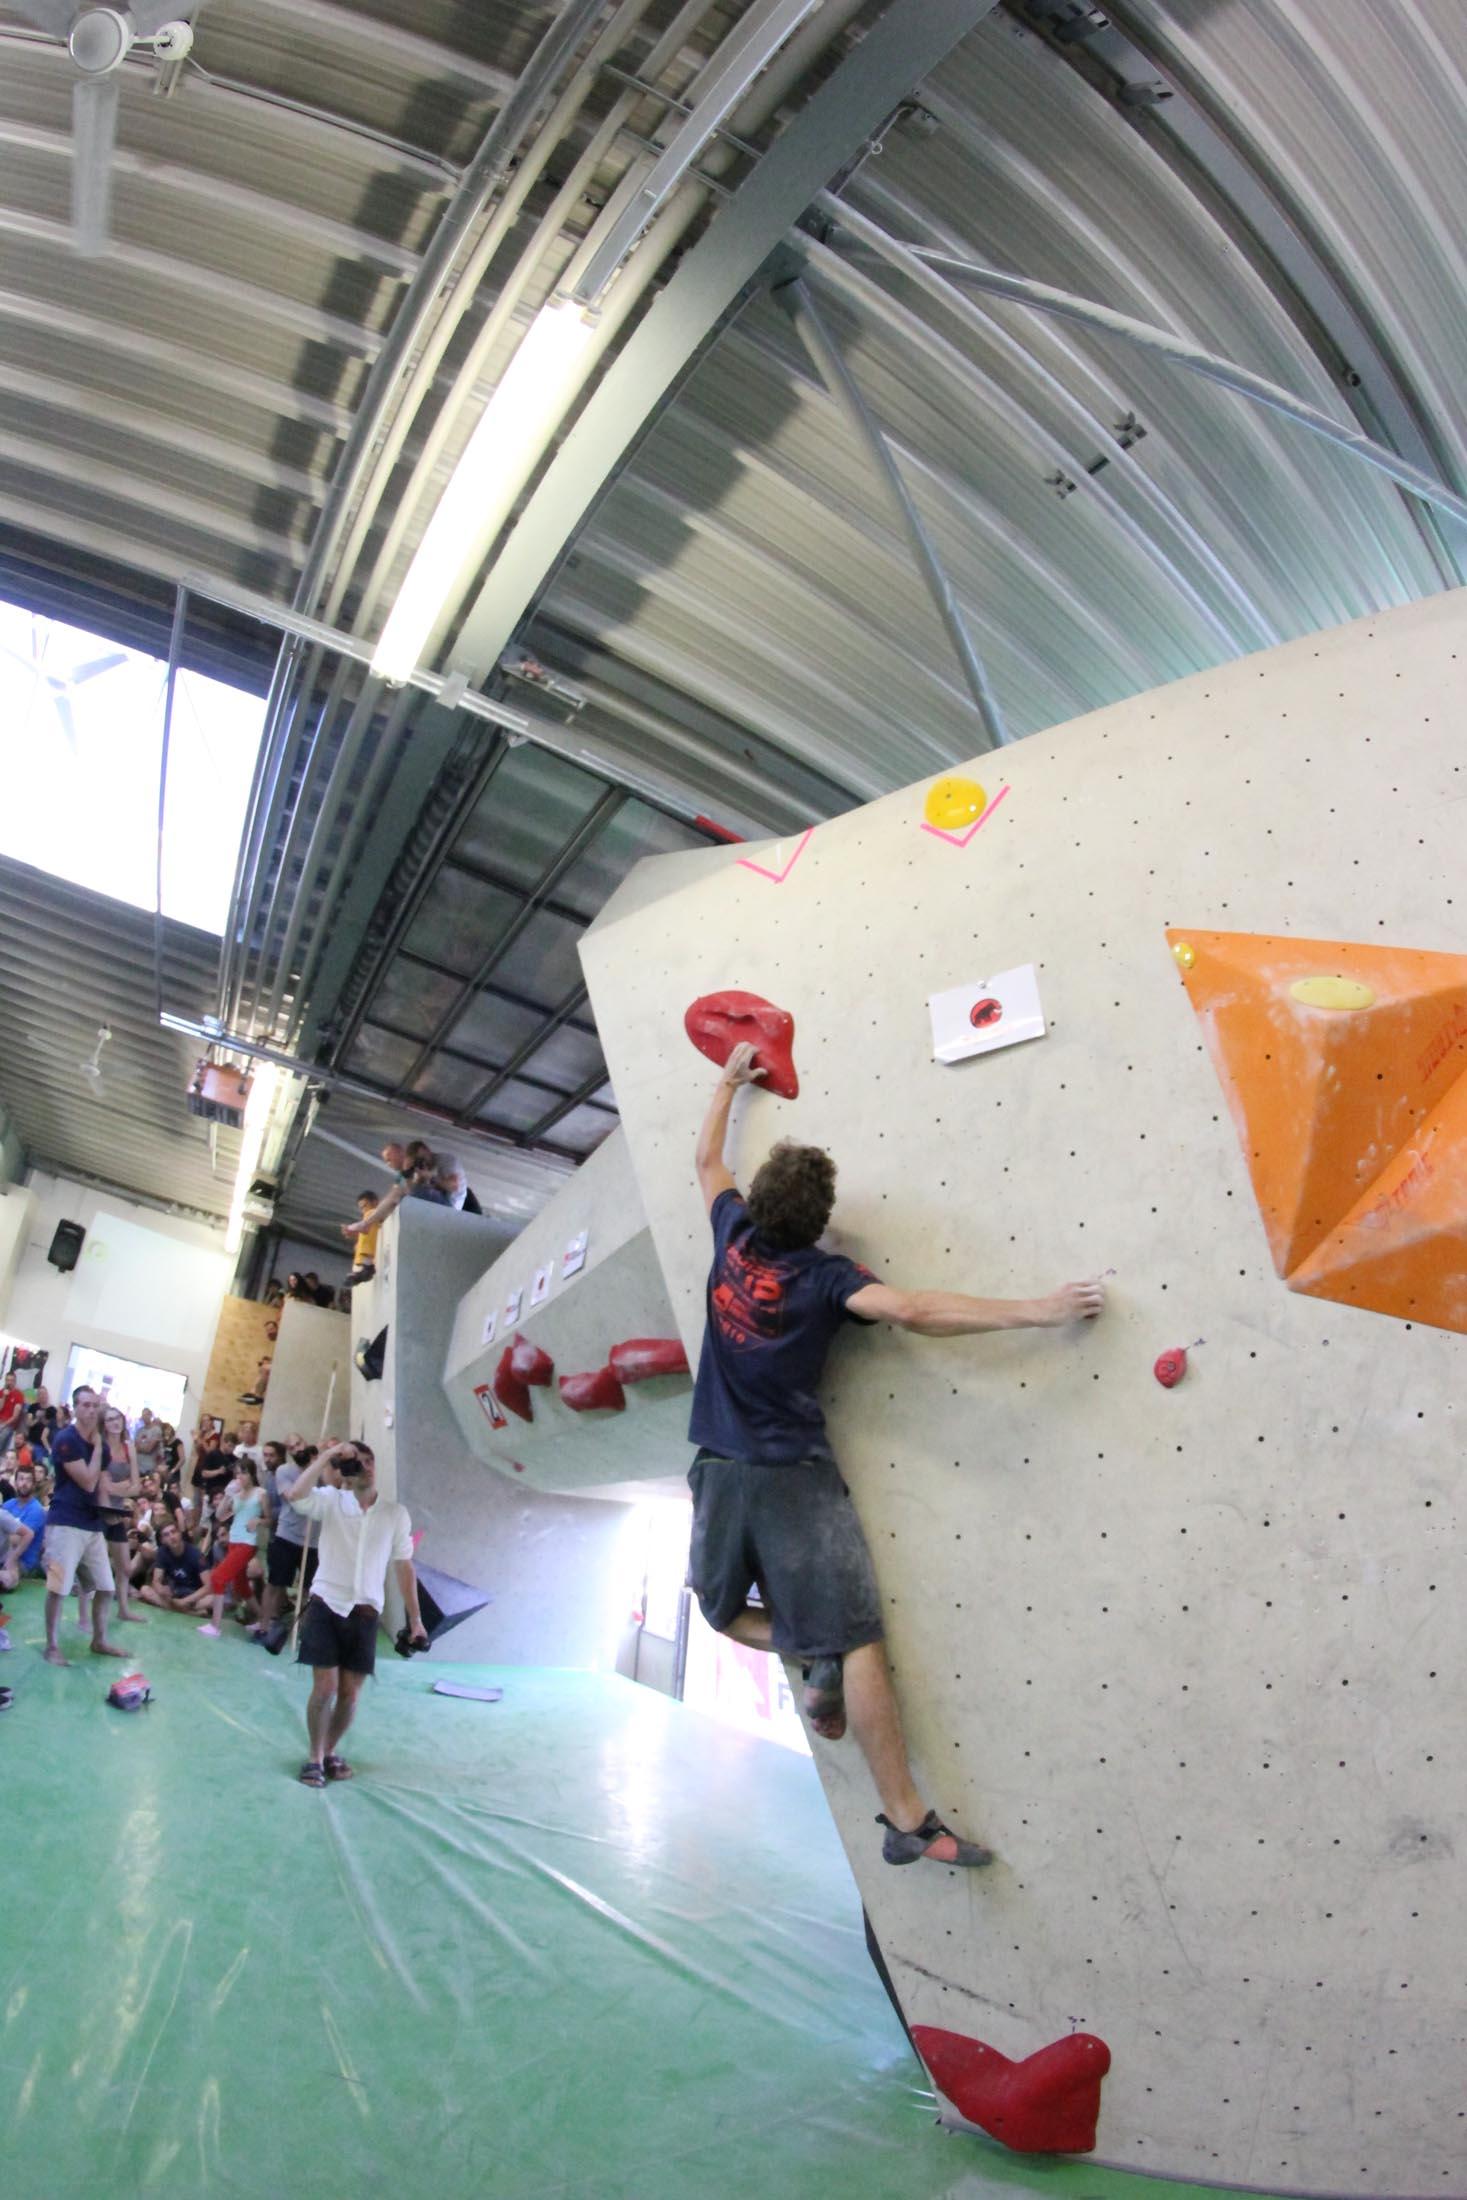 Finale, internationaler bouldercup Frankenjura 2016, BLOCKHELDEN Erlangen, Mammut, Bergfreunde.de, Boulderwettkampf07092016588